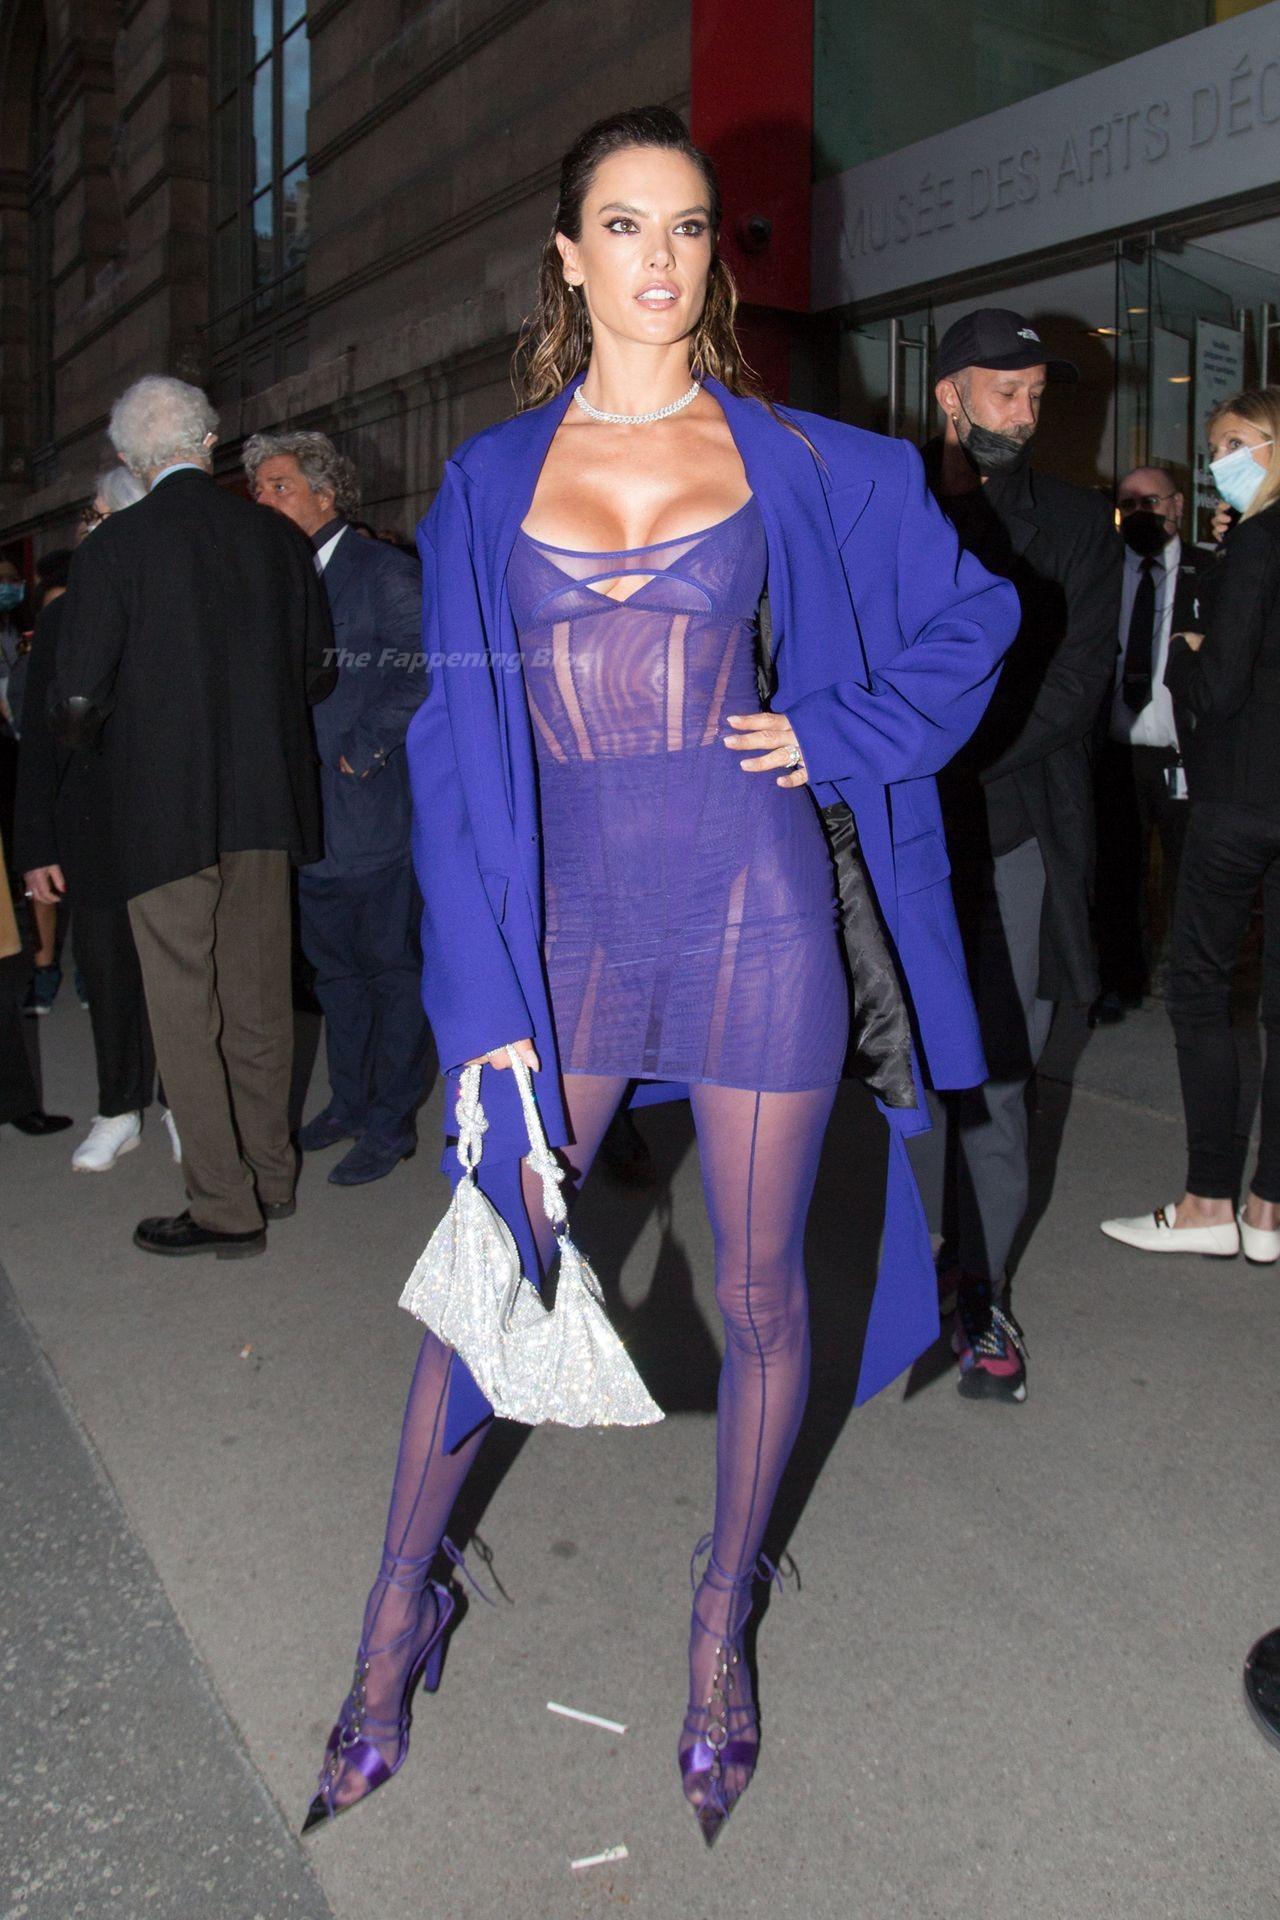 Alessandra-Ambrosio-Sexy-The-Fappening-Blog-9-3.jpg